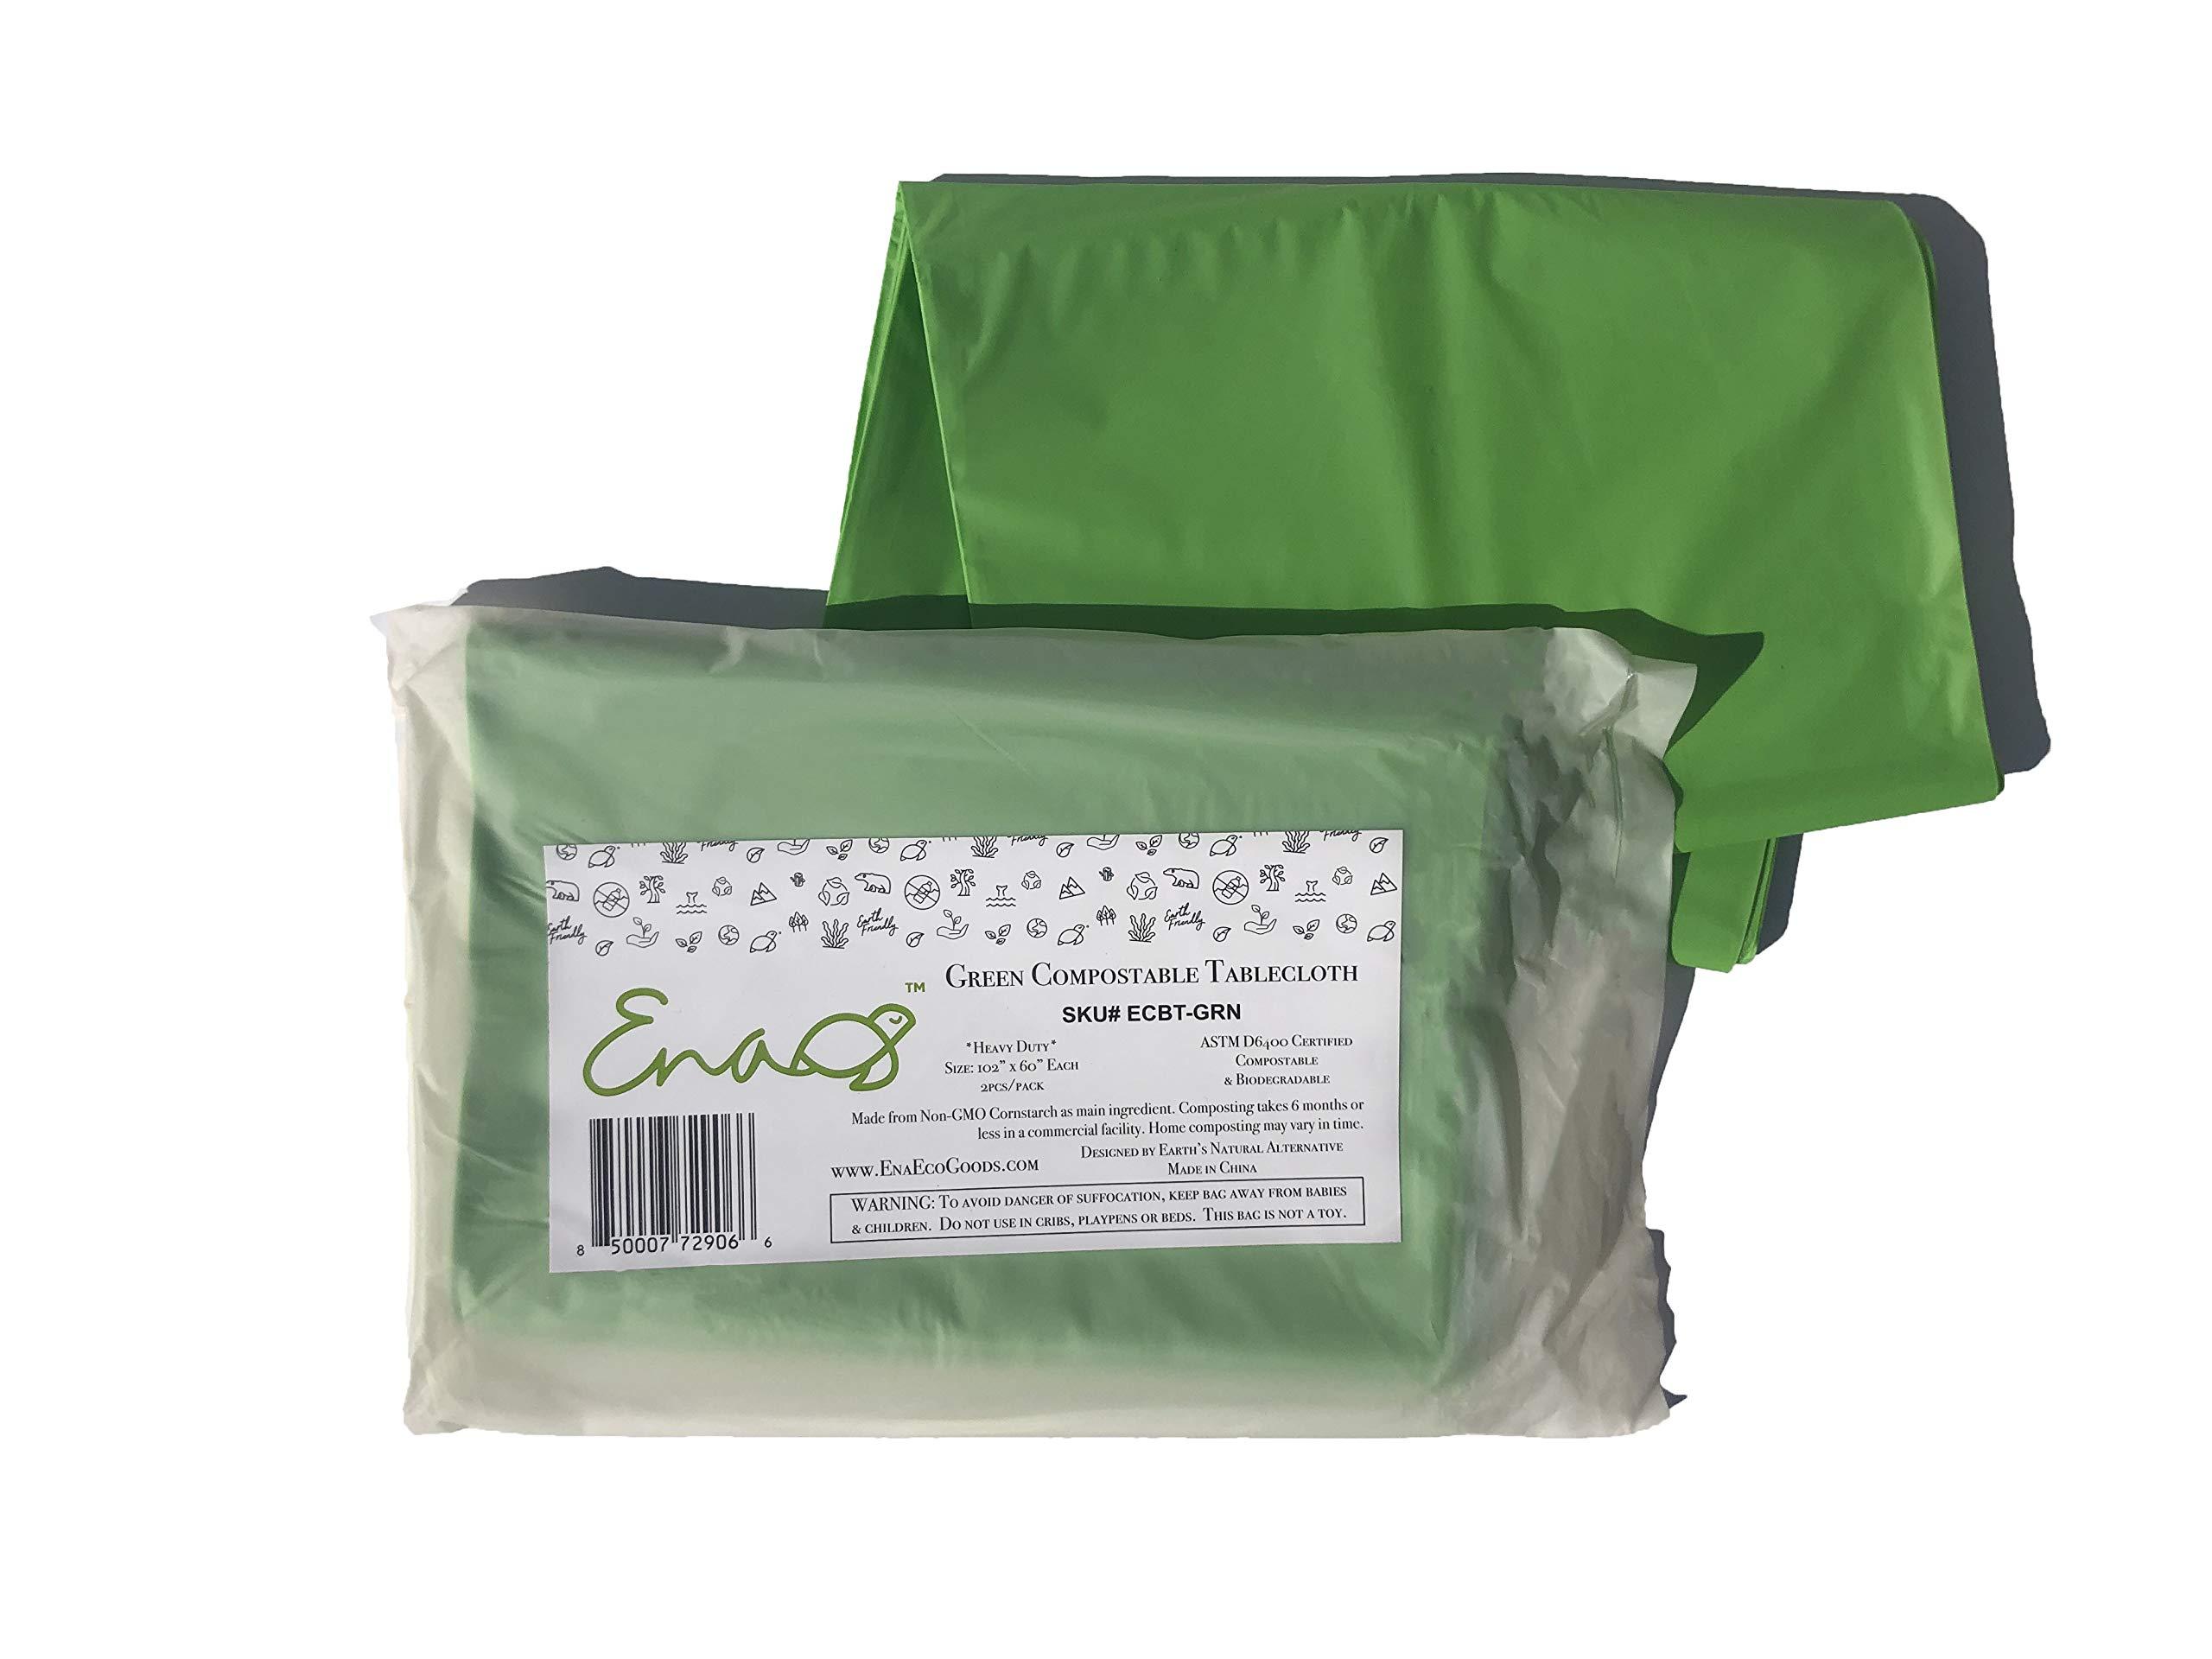 Earth's Natural Alternative ECBT-GRN Eco Friendly Compostable Tablecloth, 102x60, Green